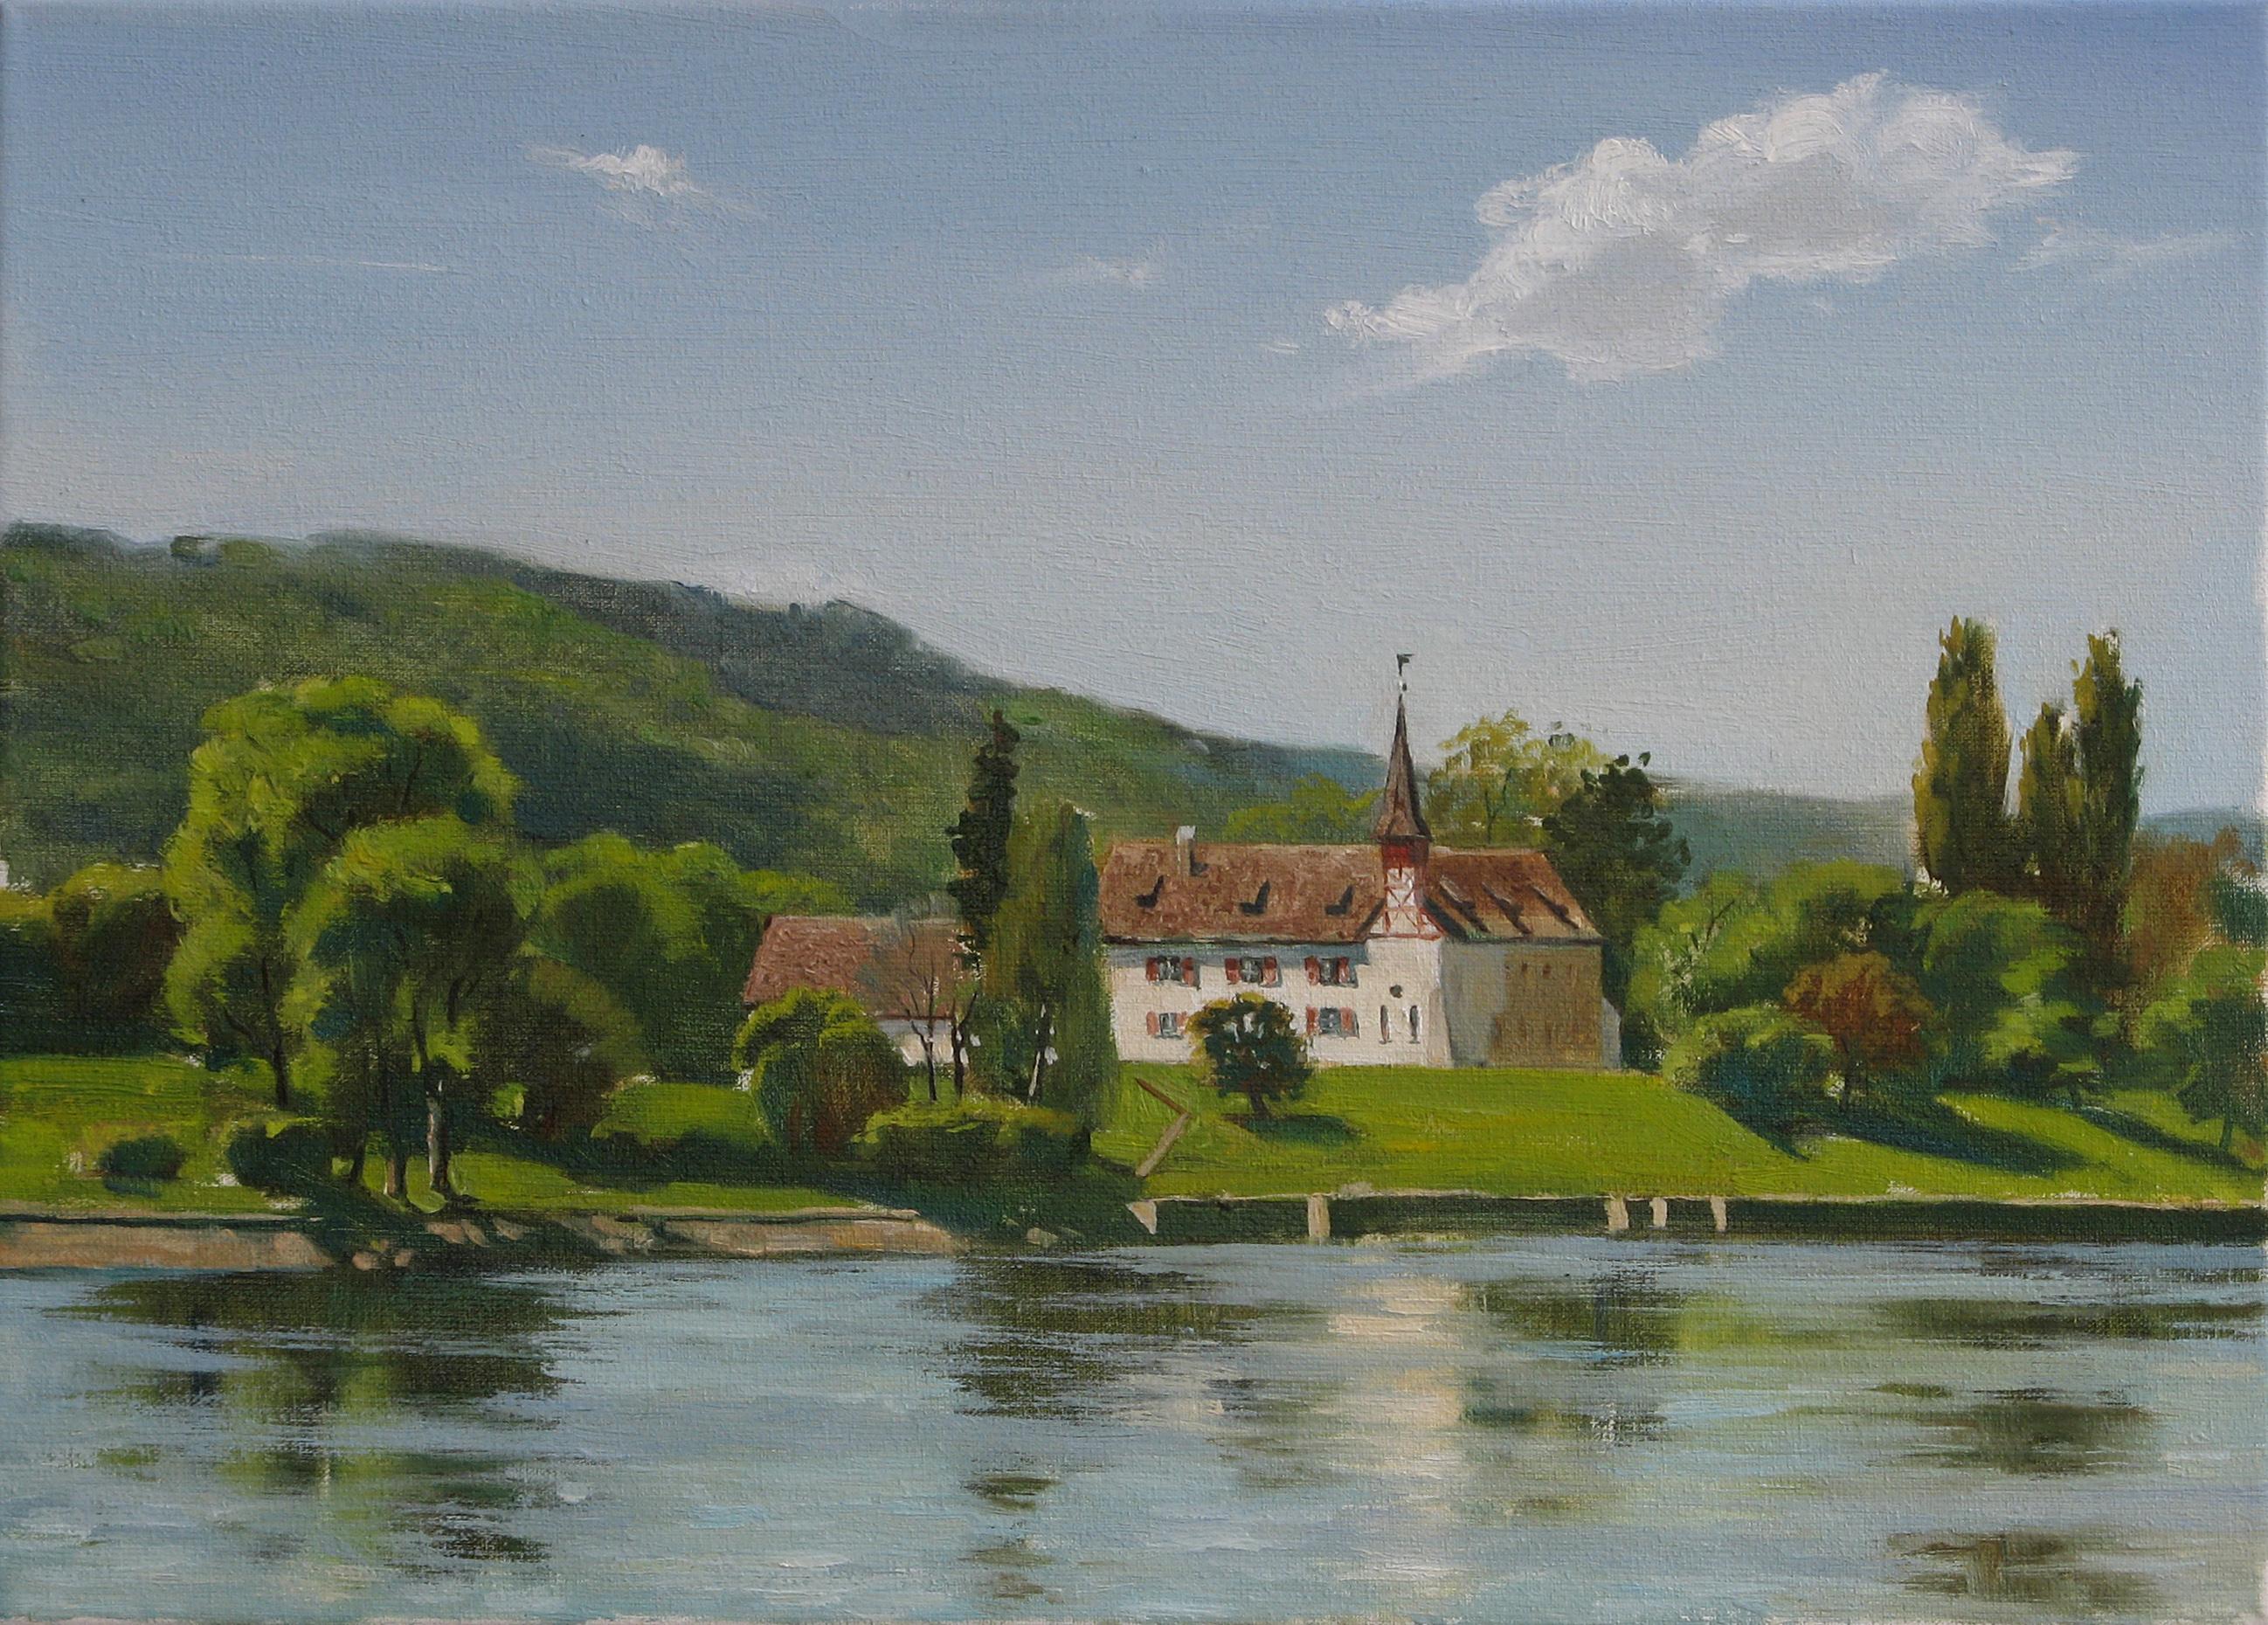 Landschaftsmalerei realismus  Landschaft | Kunst. Alexander Gerlach & Olga Gerlach (Kireeva)